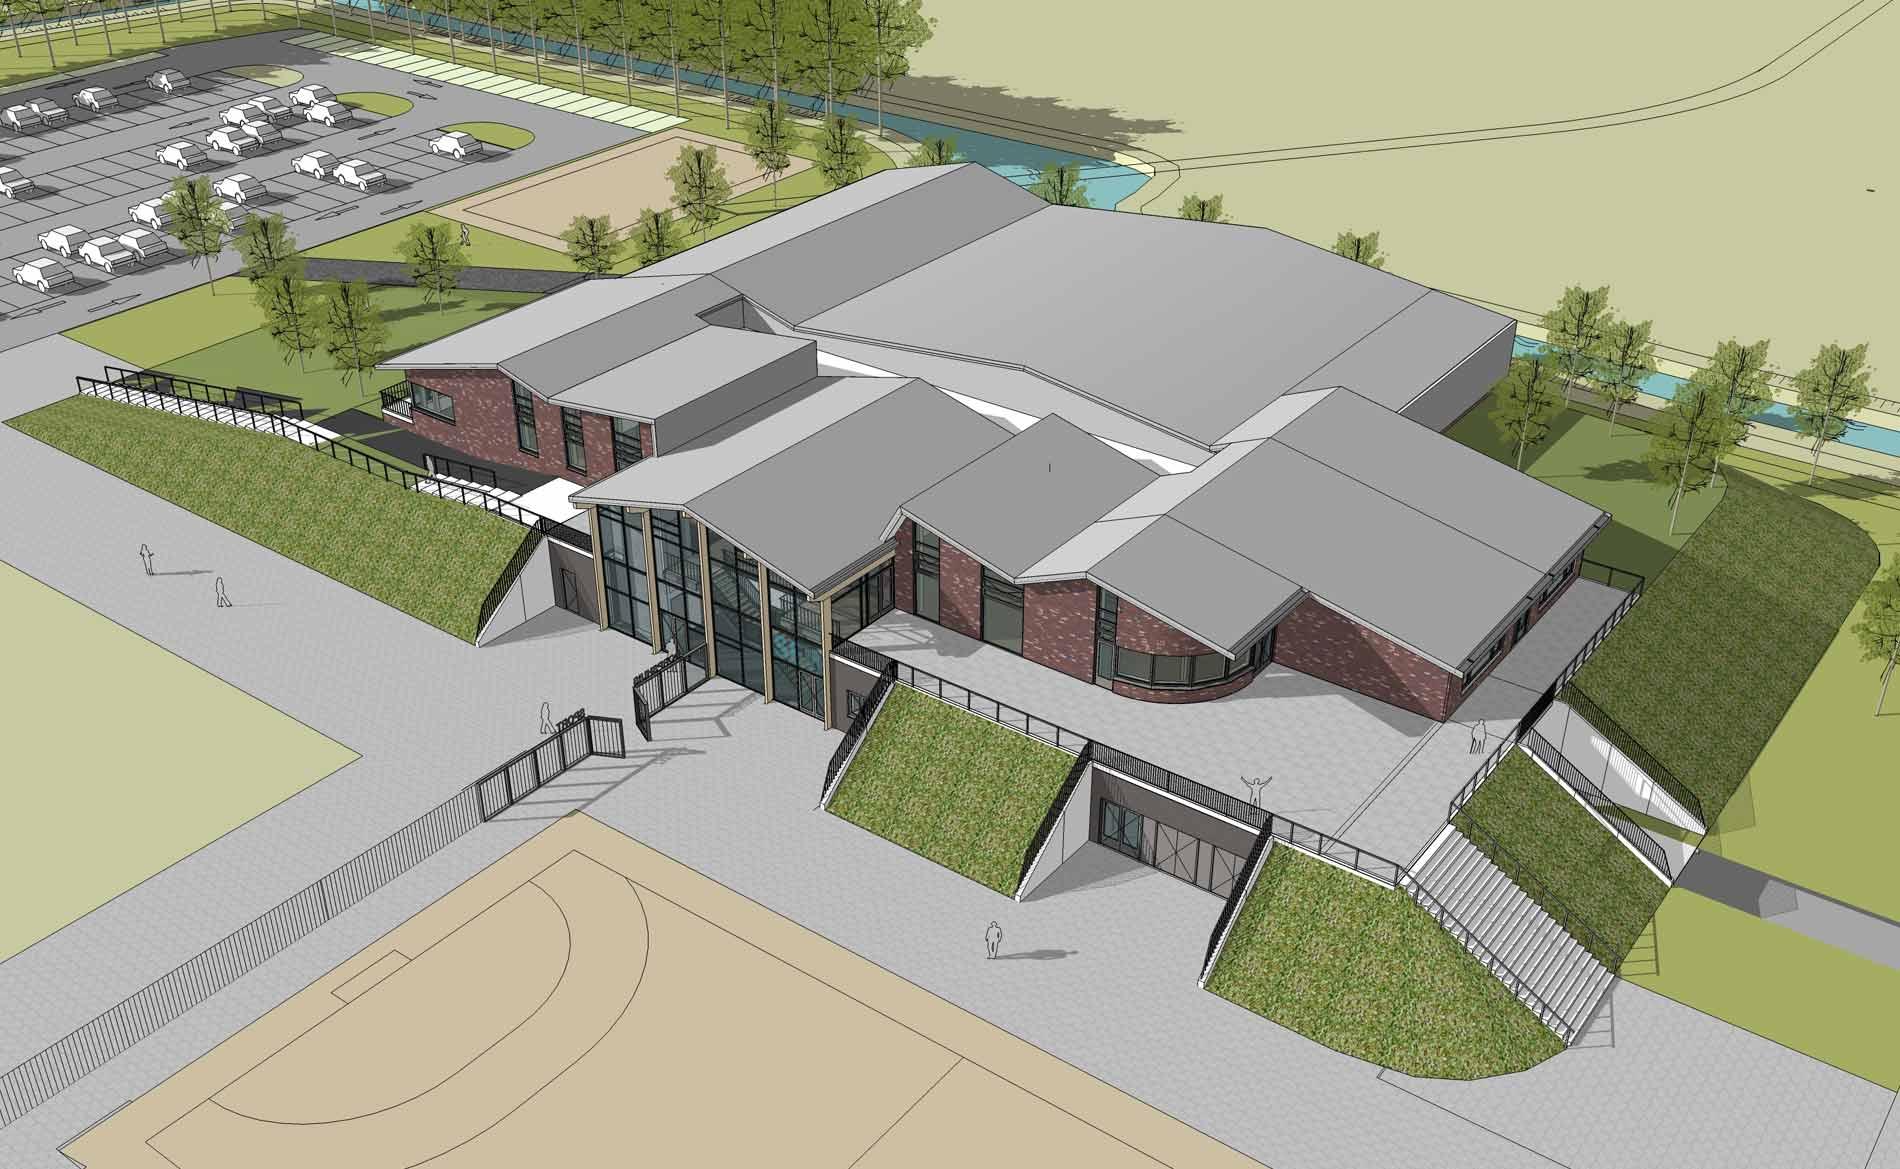 architect sporthal MFA multifunctionele accommodatie sport De Dres Nibbixwoud BBHD architecten